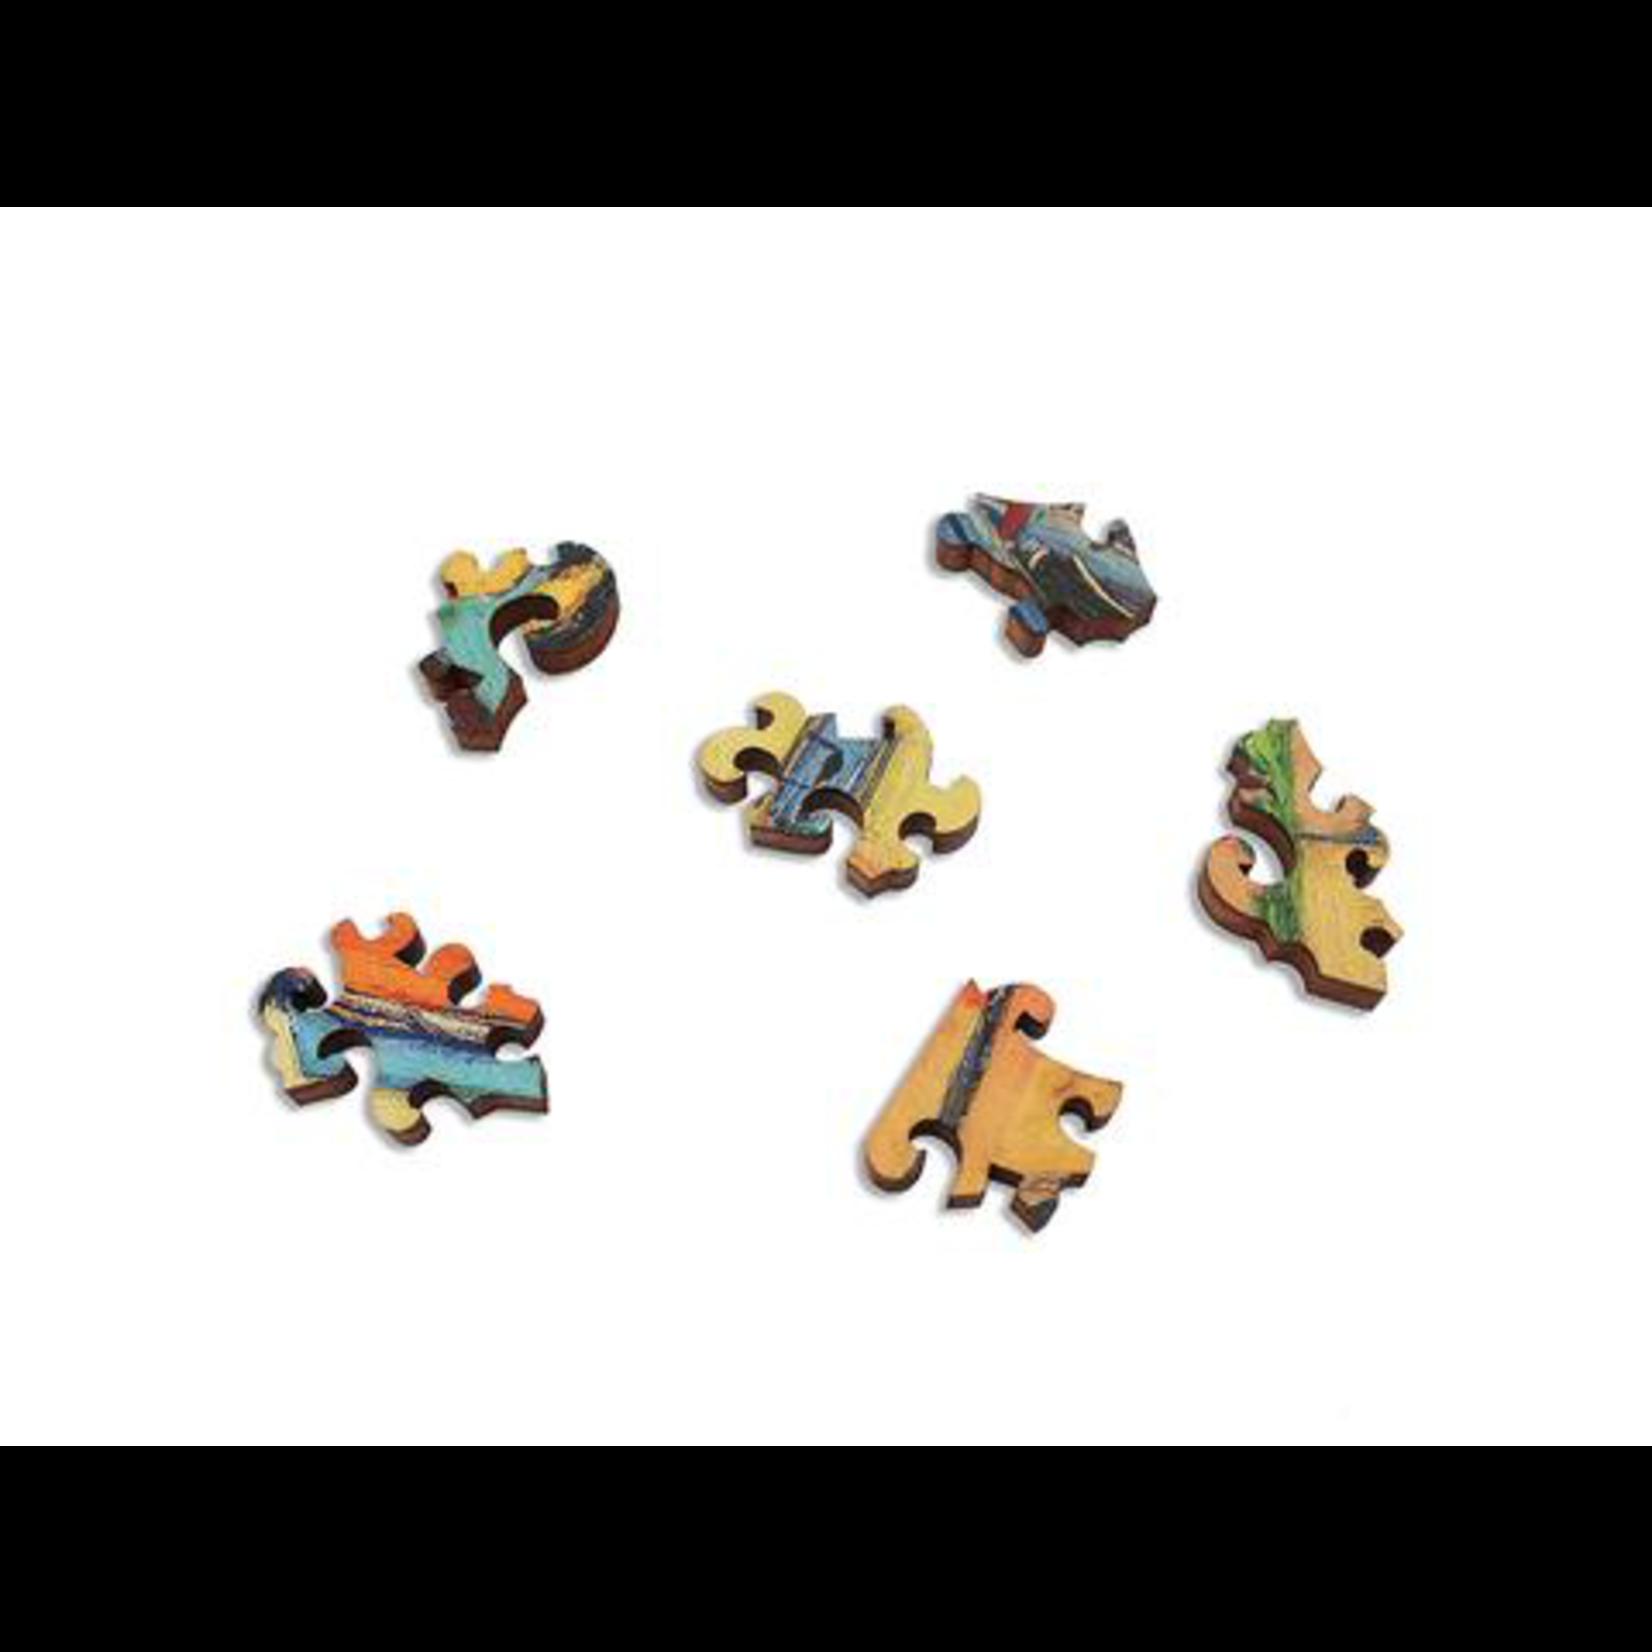 Artifact Puzzles Martigues, N Klopp 302pc